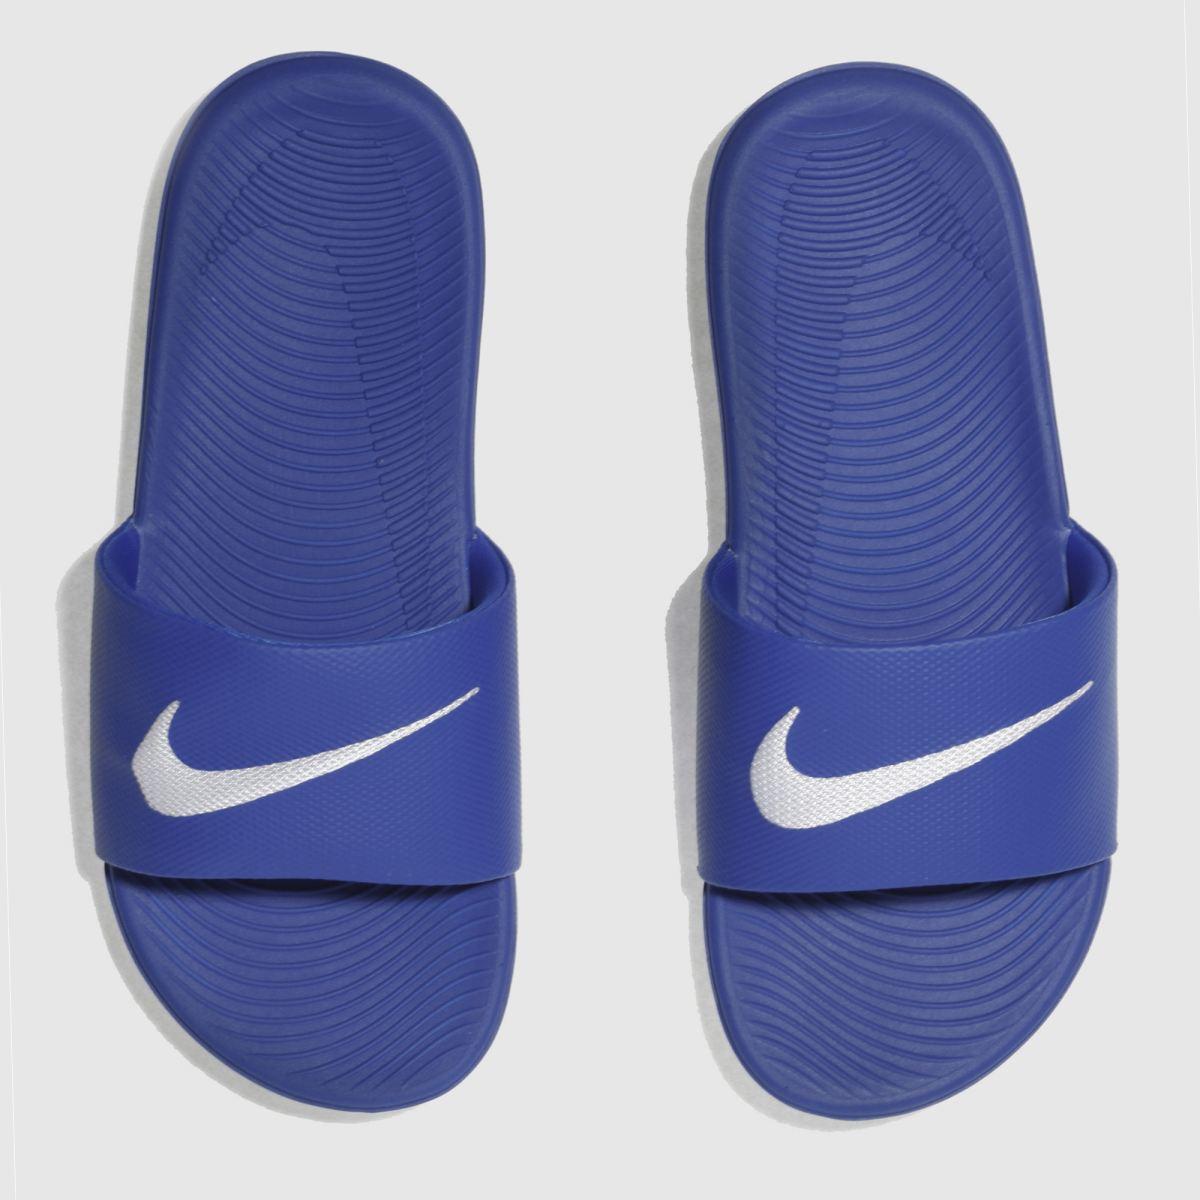 Nike Blue Kawa Slide Boys Youth Sandals